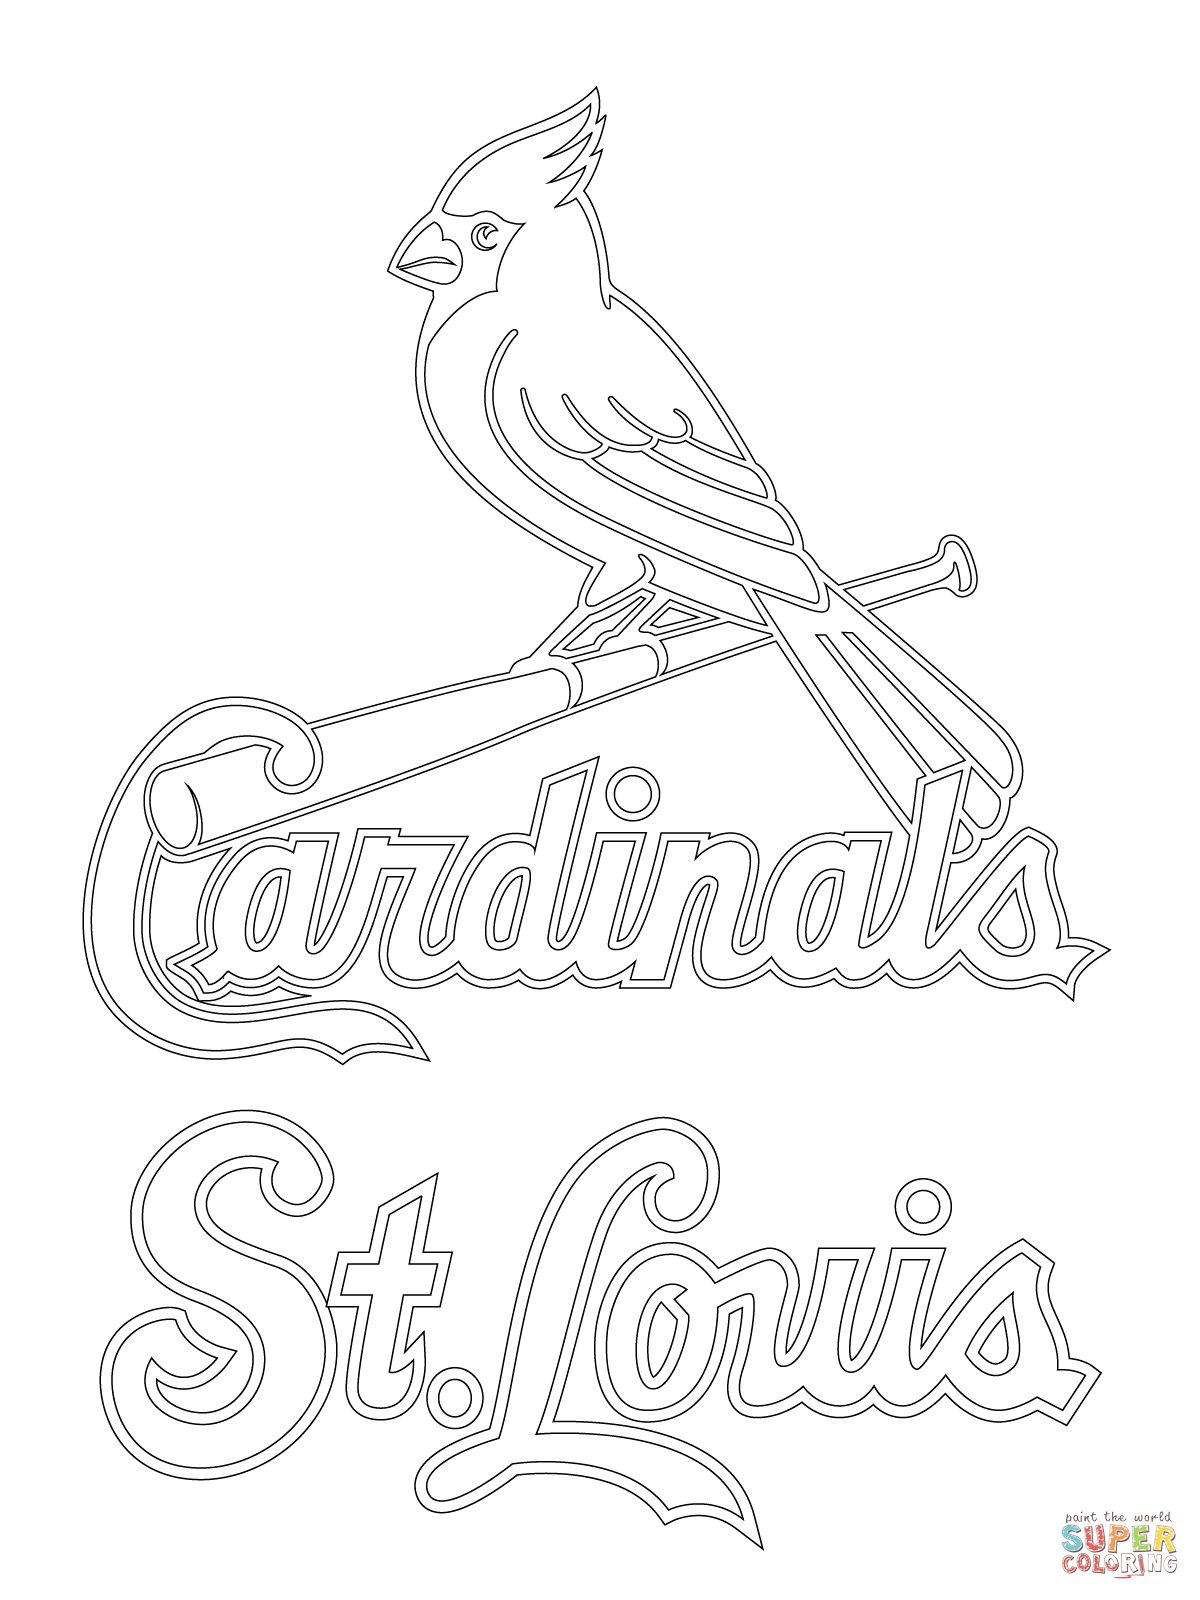 St Louis Cardinals Logo Coloring Page Supercoloring Com St